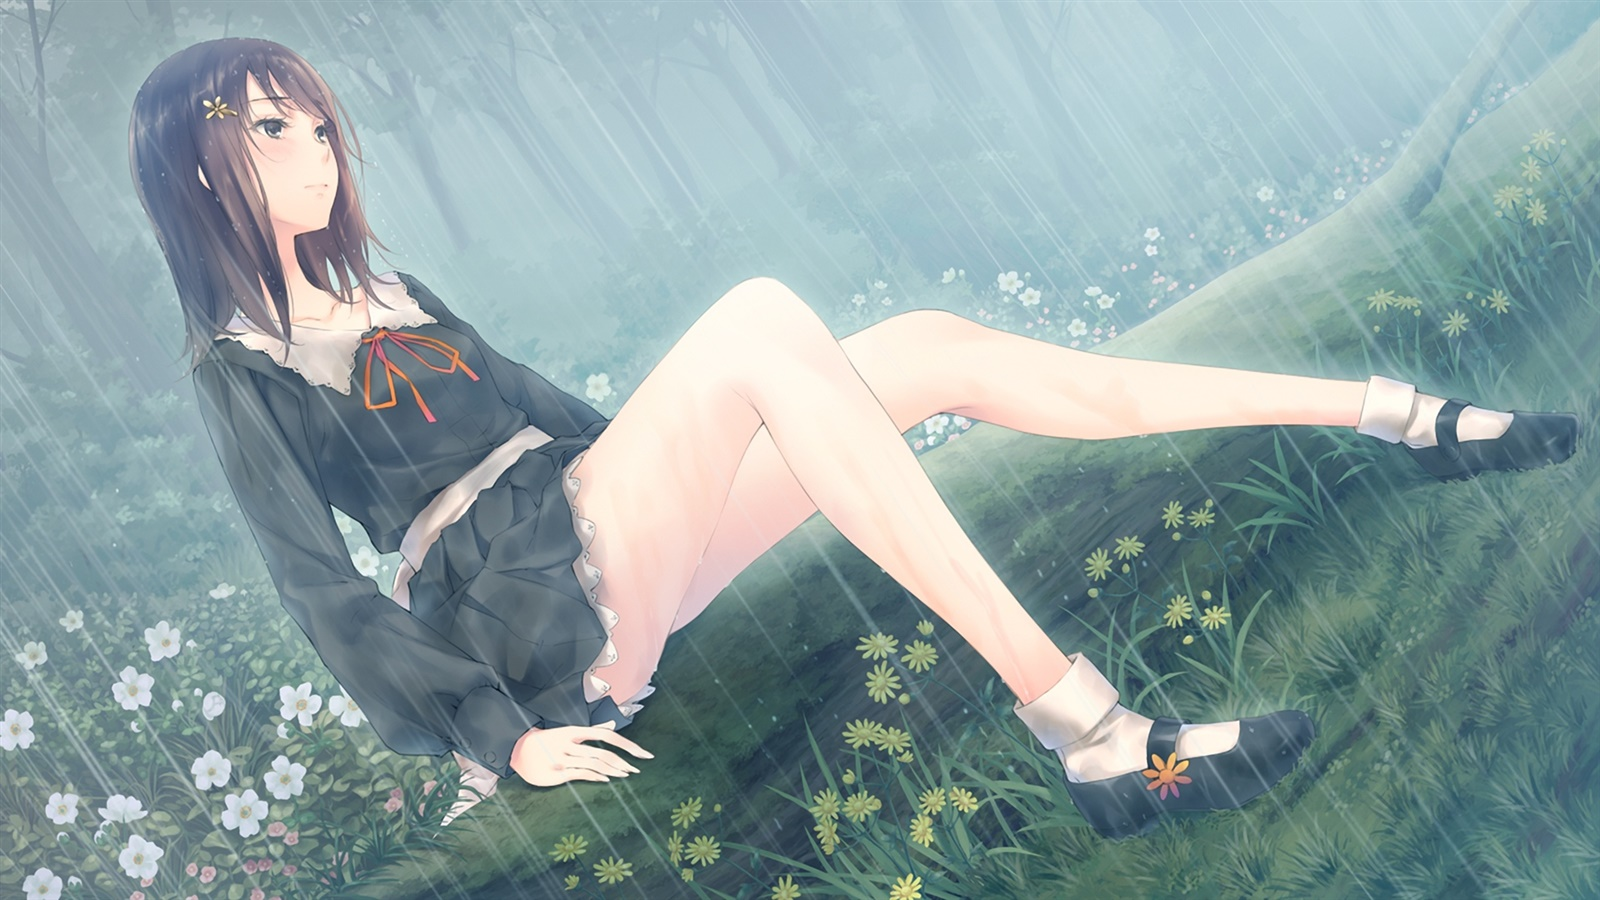 anime rain green wallpaper - photo #19